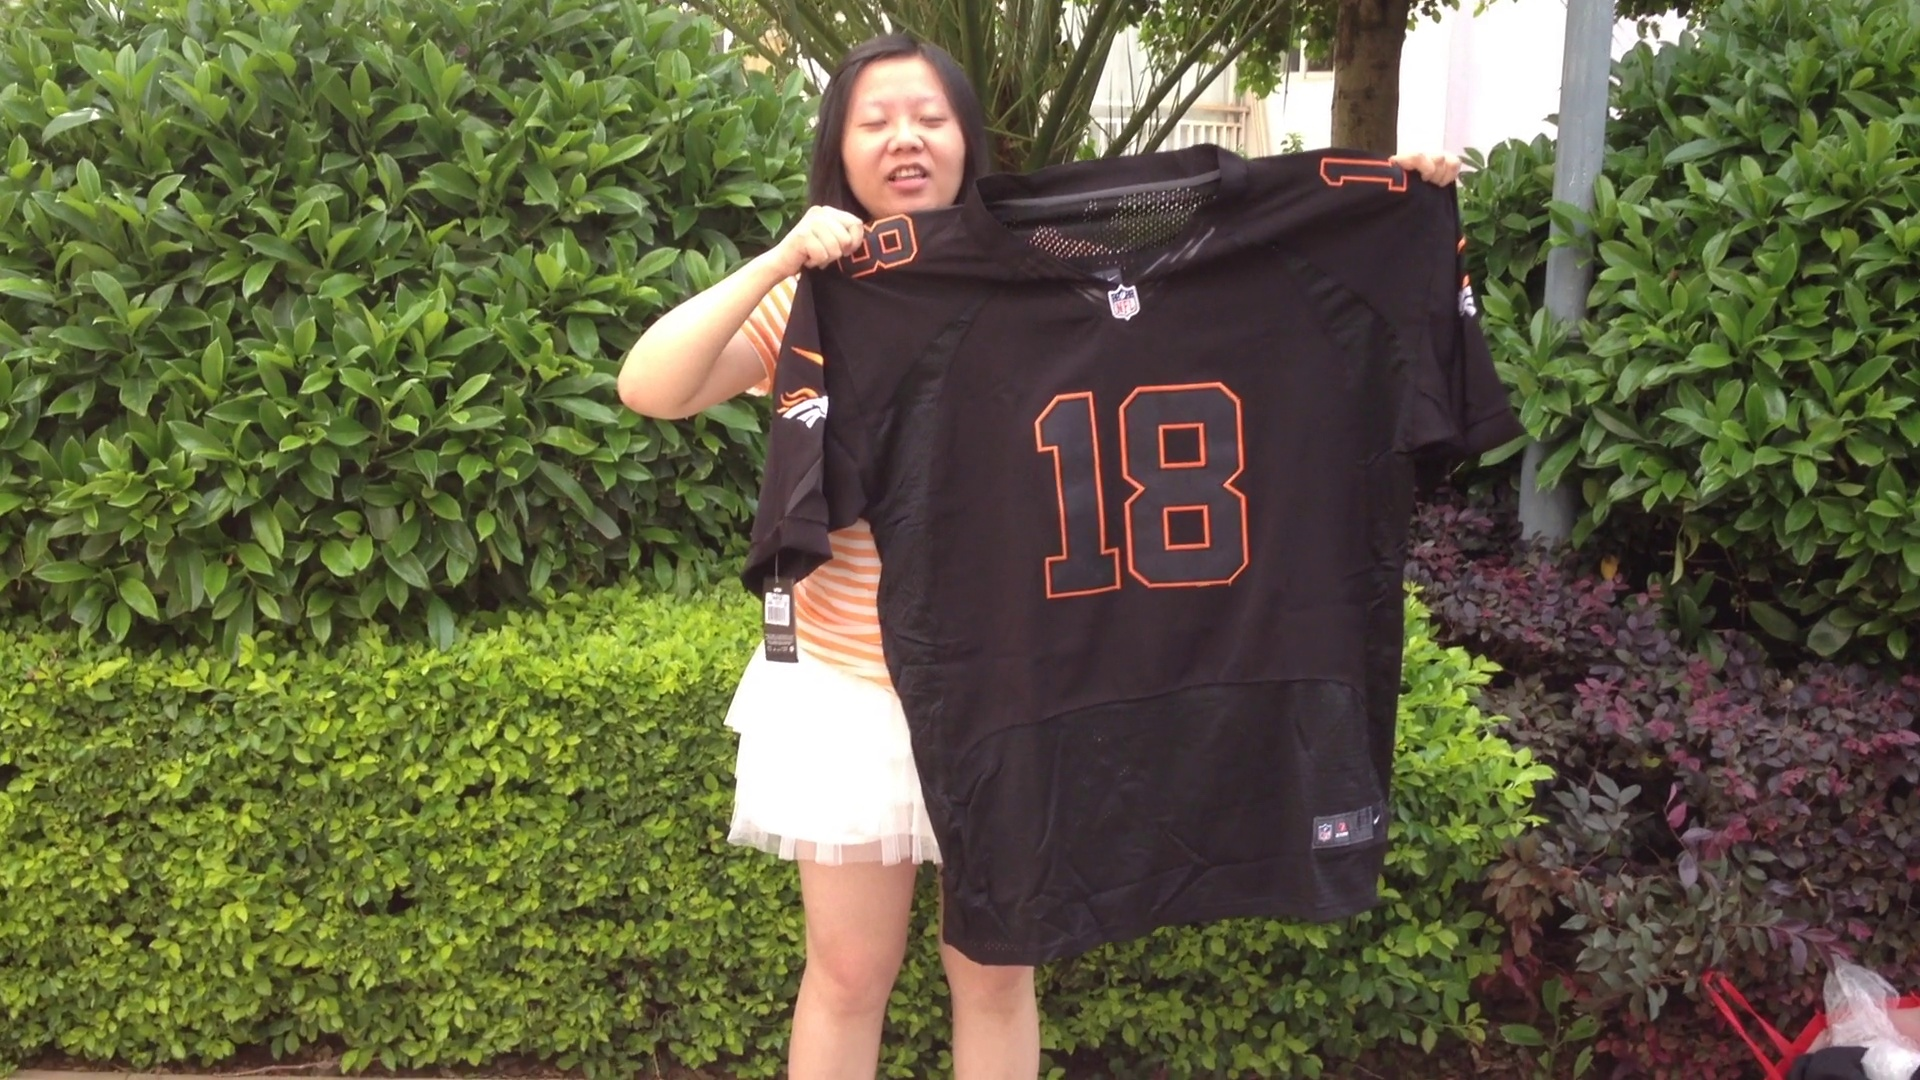 Cheap Hot Denver Broncos Jersey Broncos Jerseys Peyton Manning #18 Black Jerseys sale at jerseys-china.cn